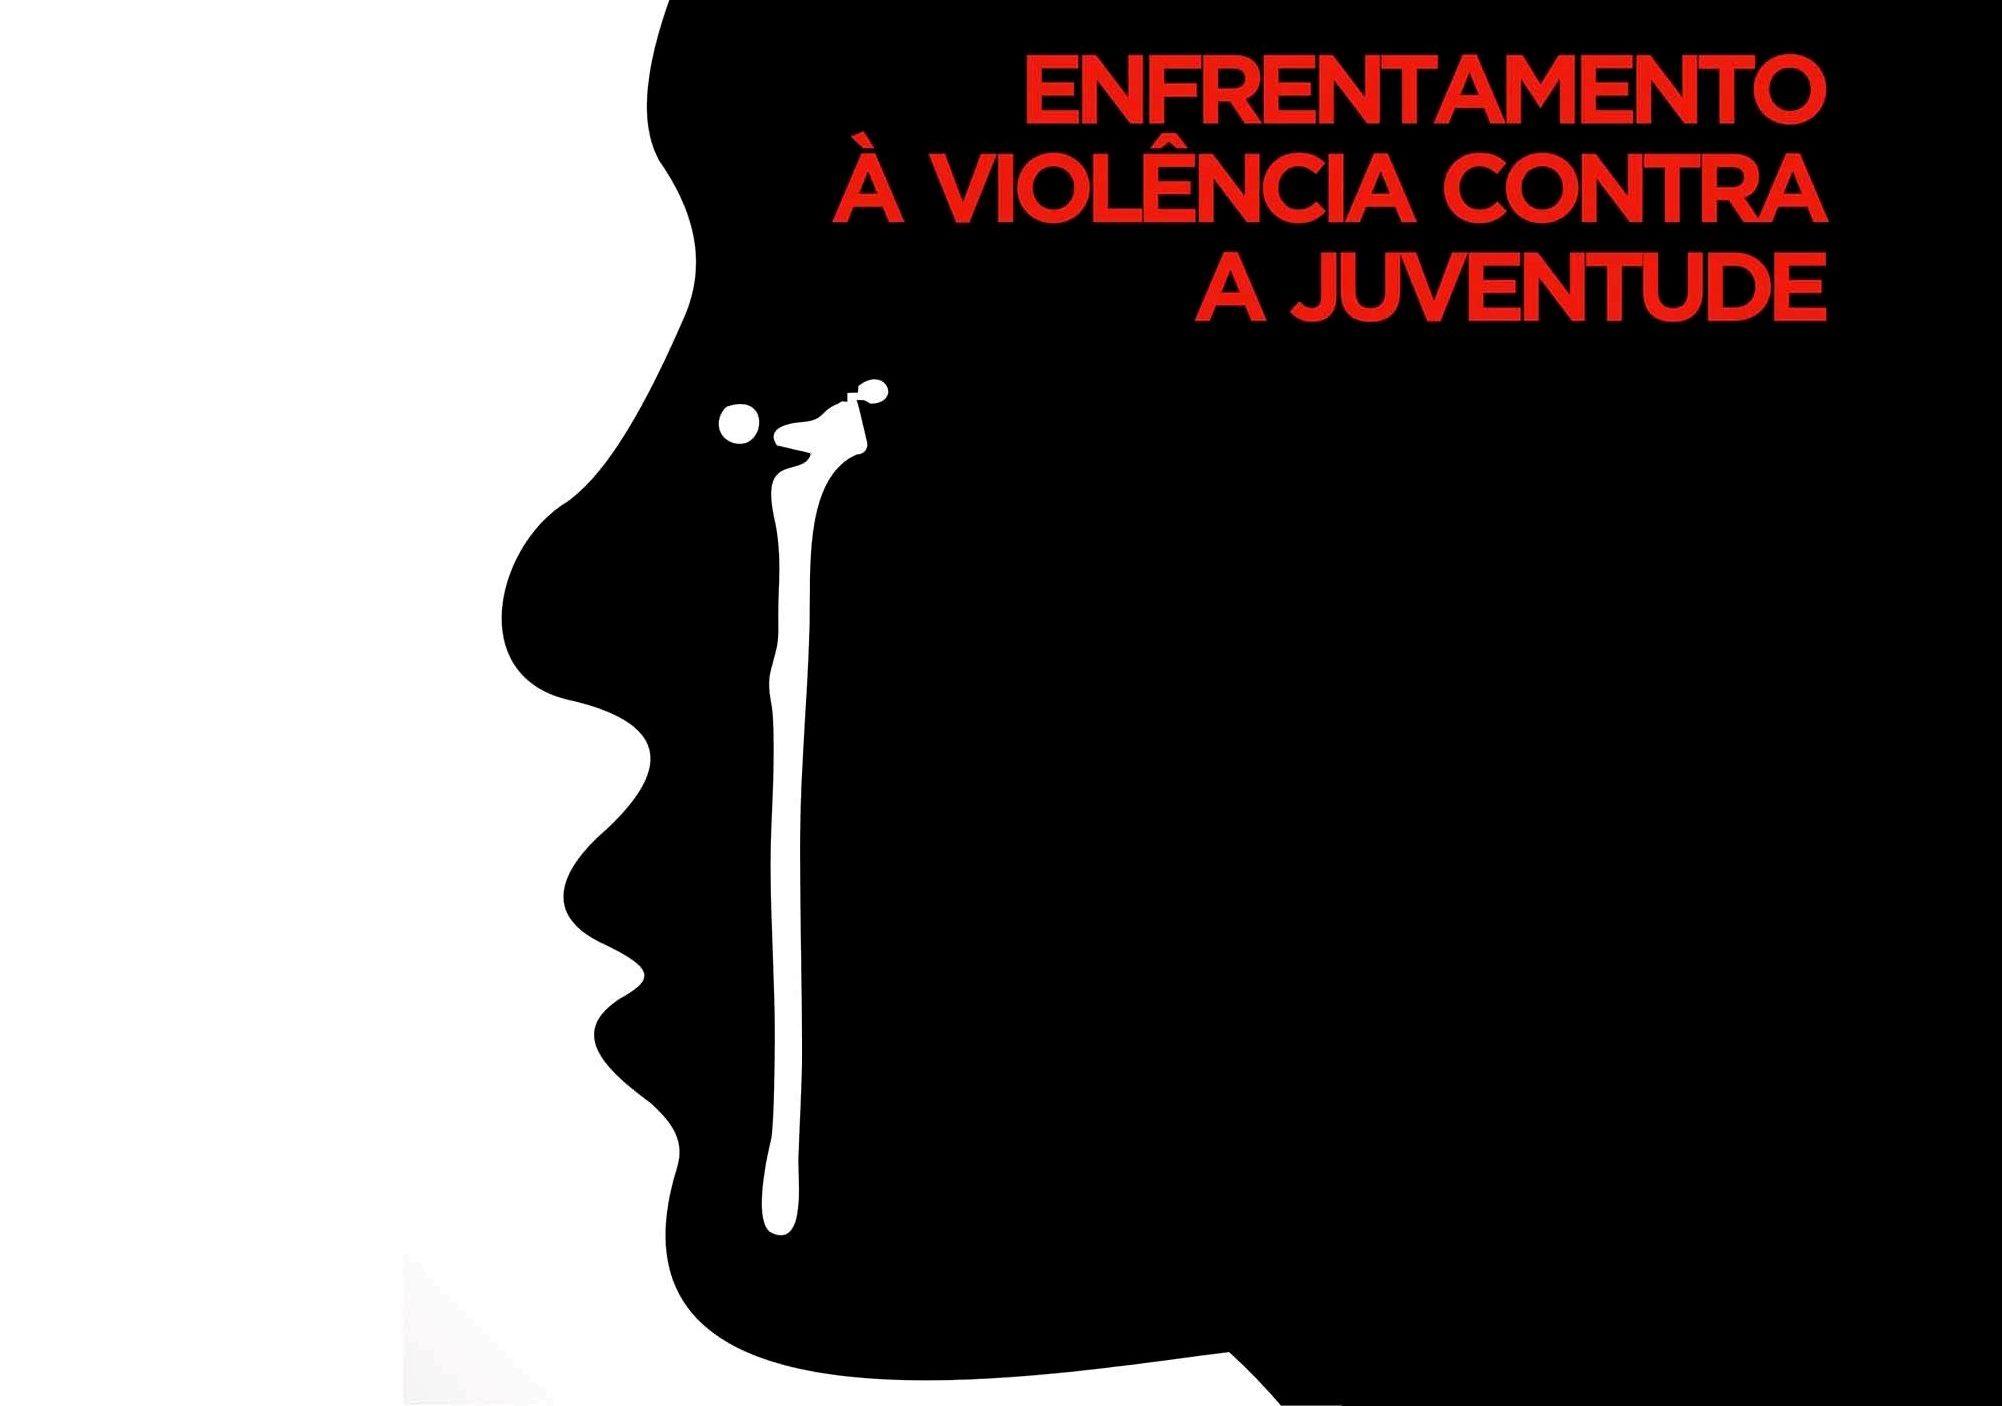 Juventude: extermínio e violência